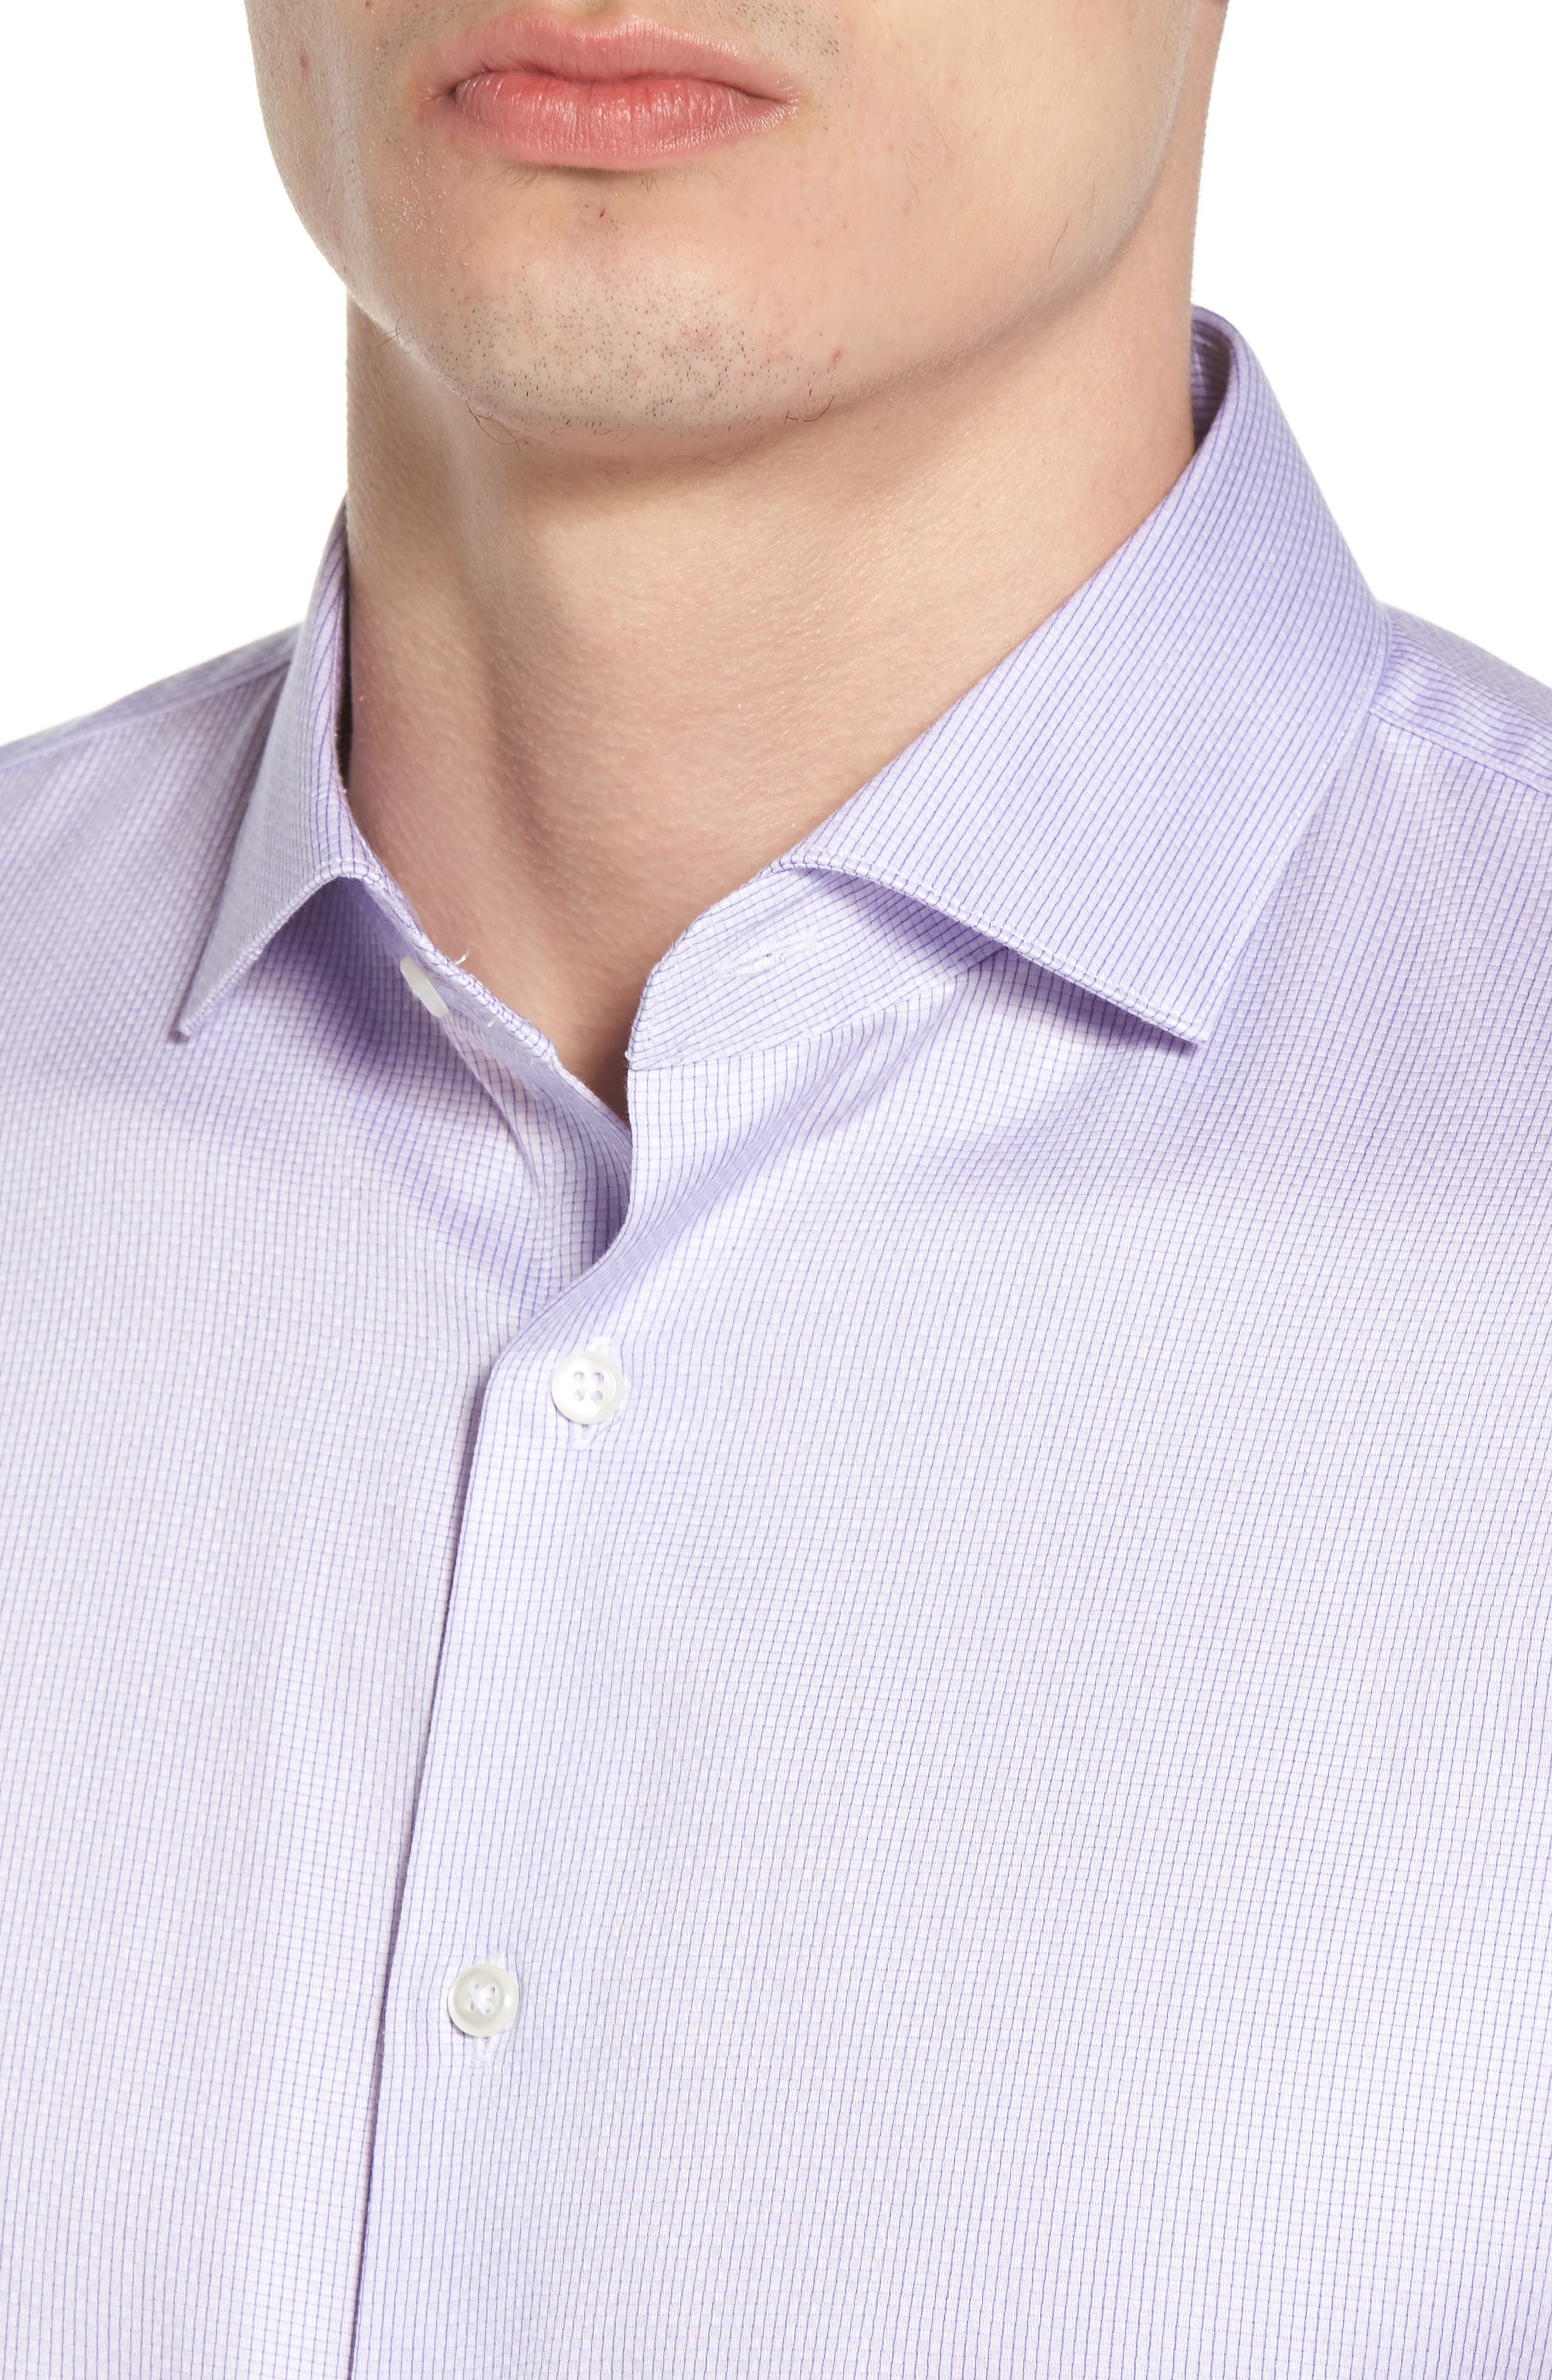 Trim Fit Stripe Dress Shirt,                             Alternate thumbnail 2, color,                             Purple Heirloom